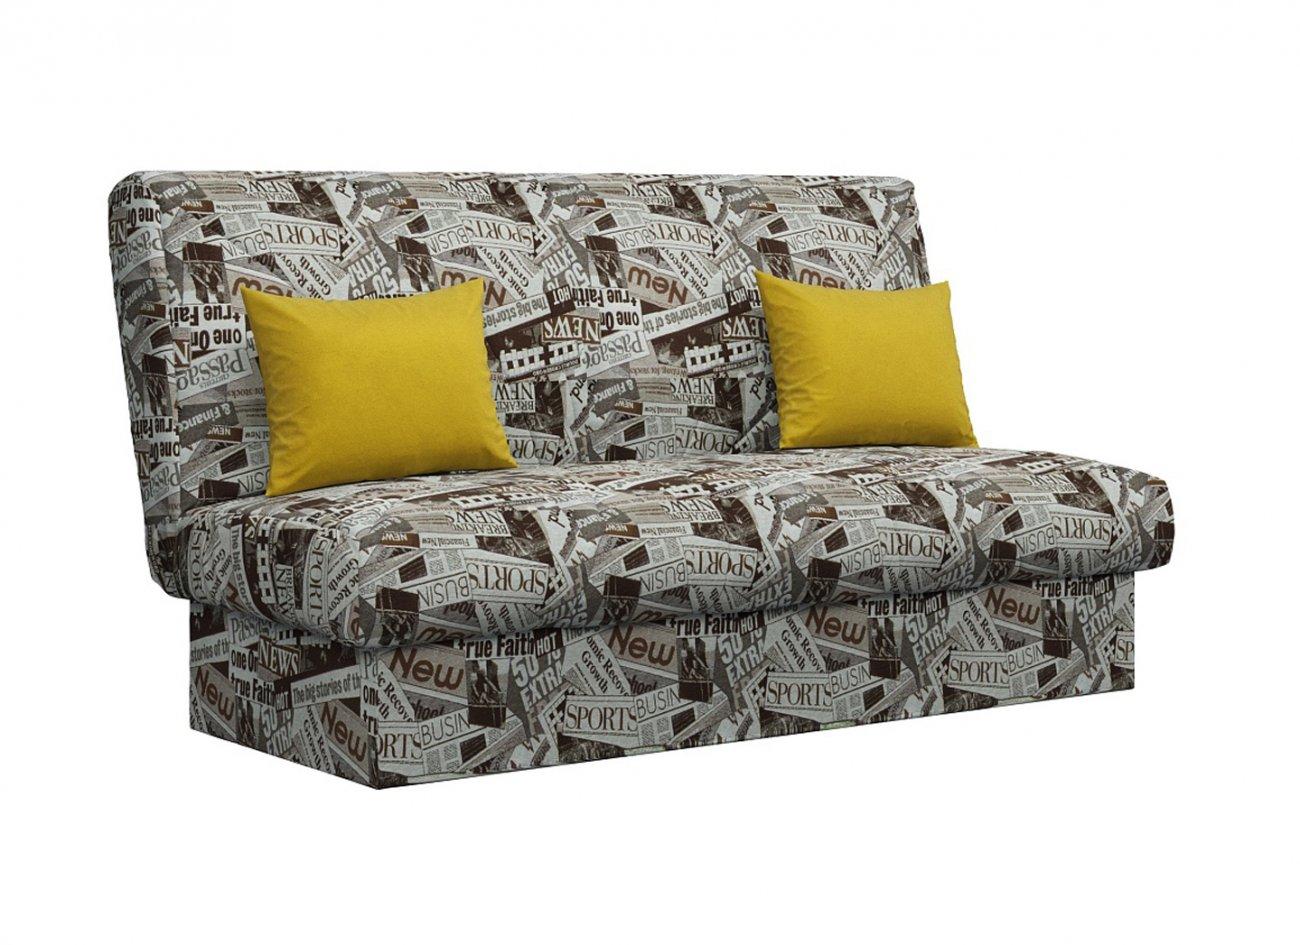 диван клик-кляк екатеринбург с фото